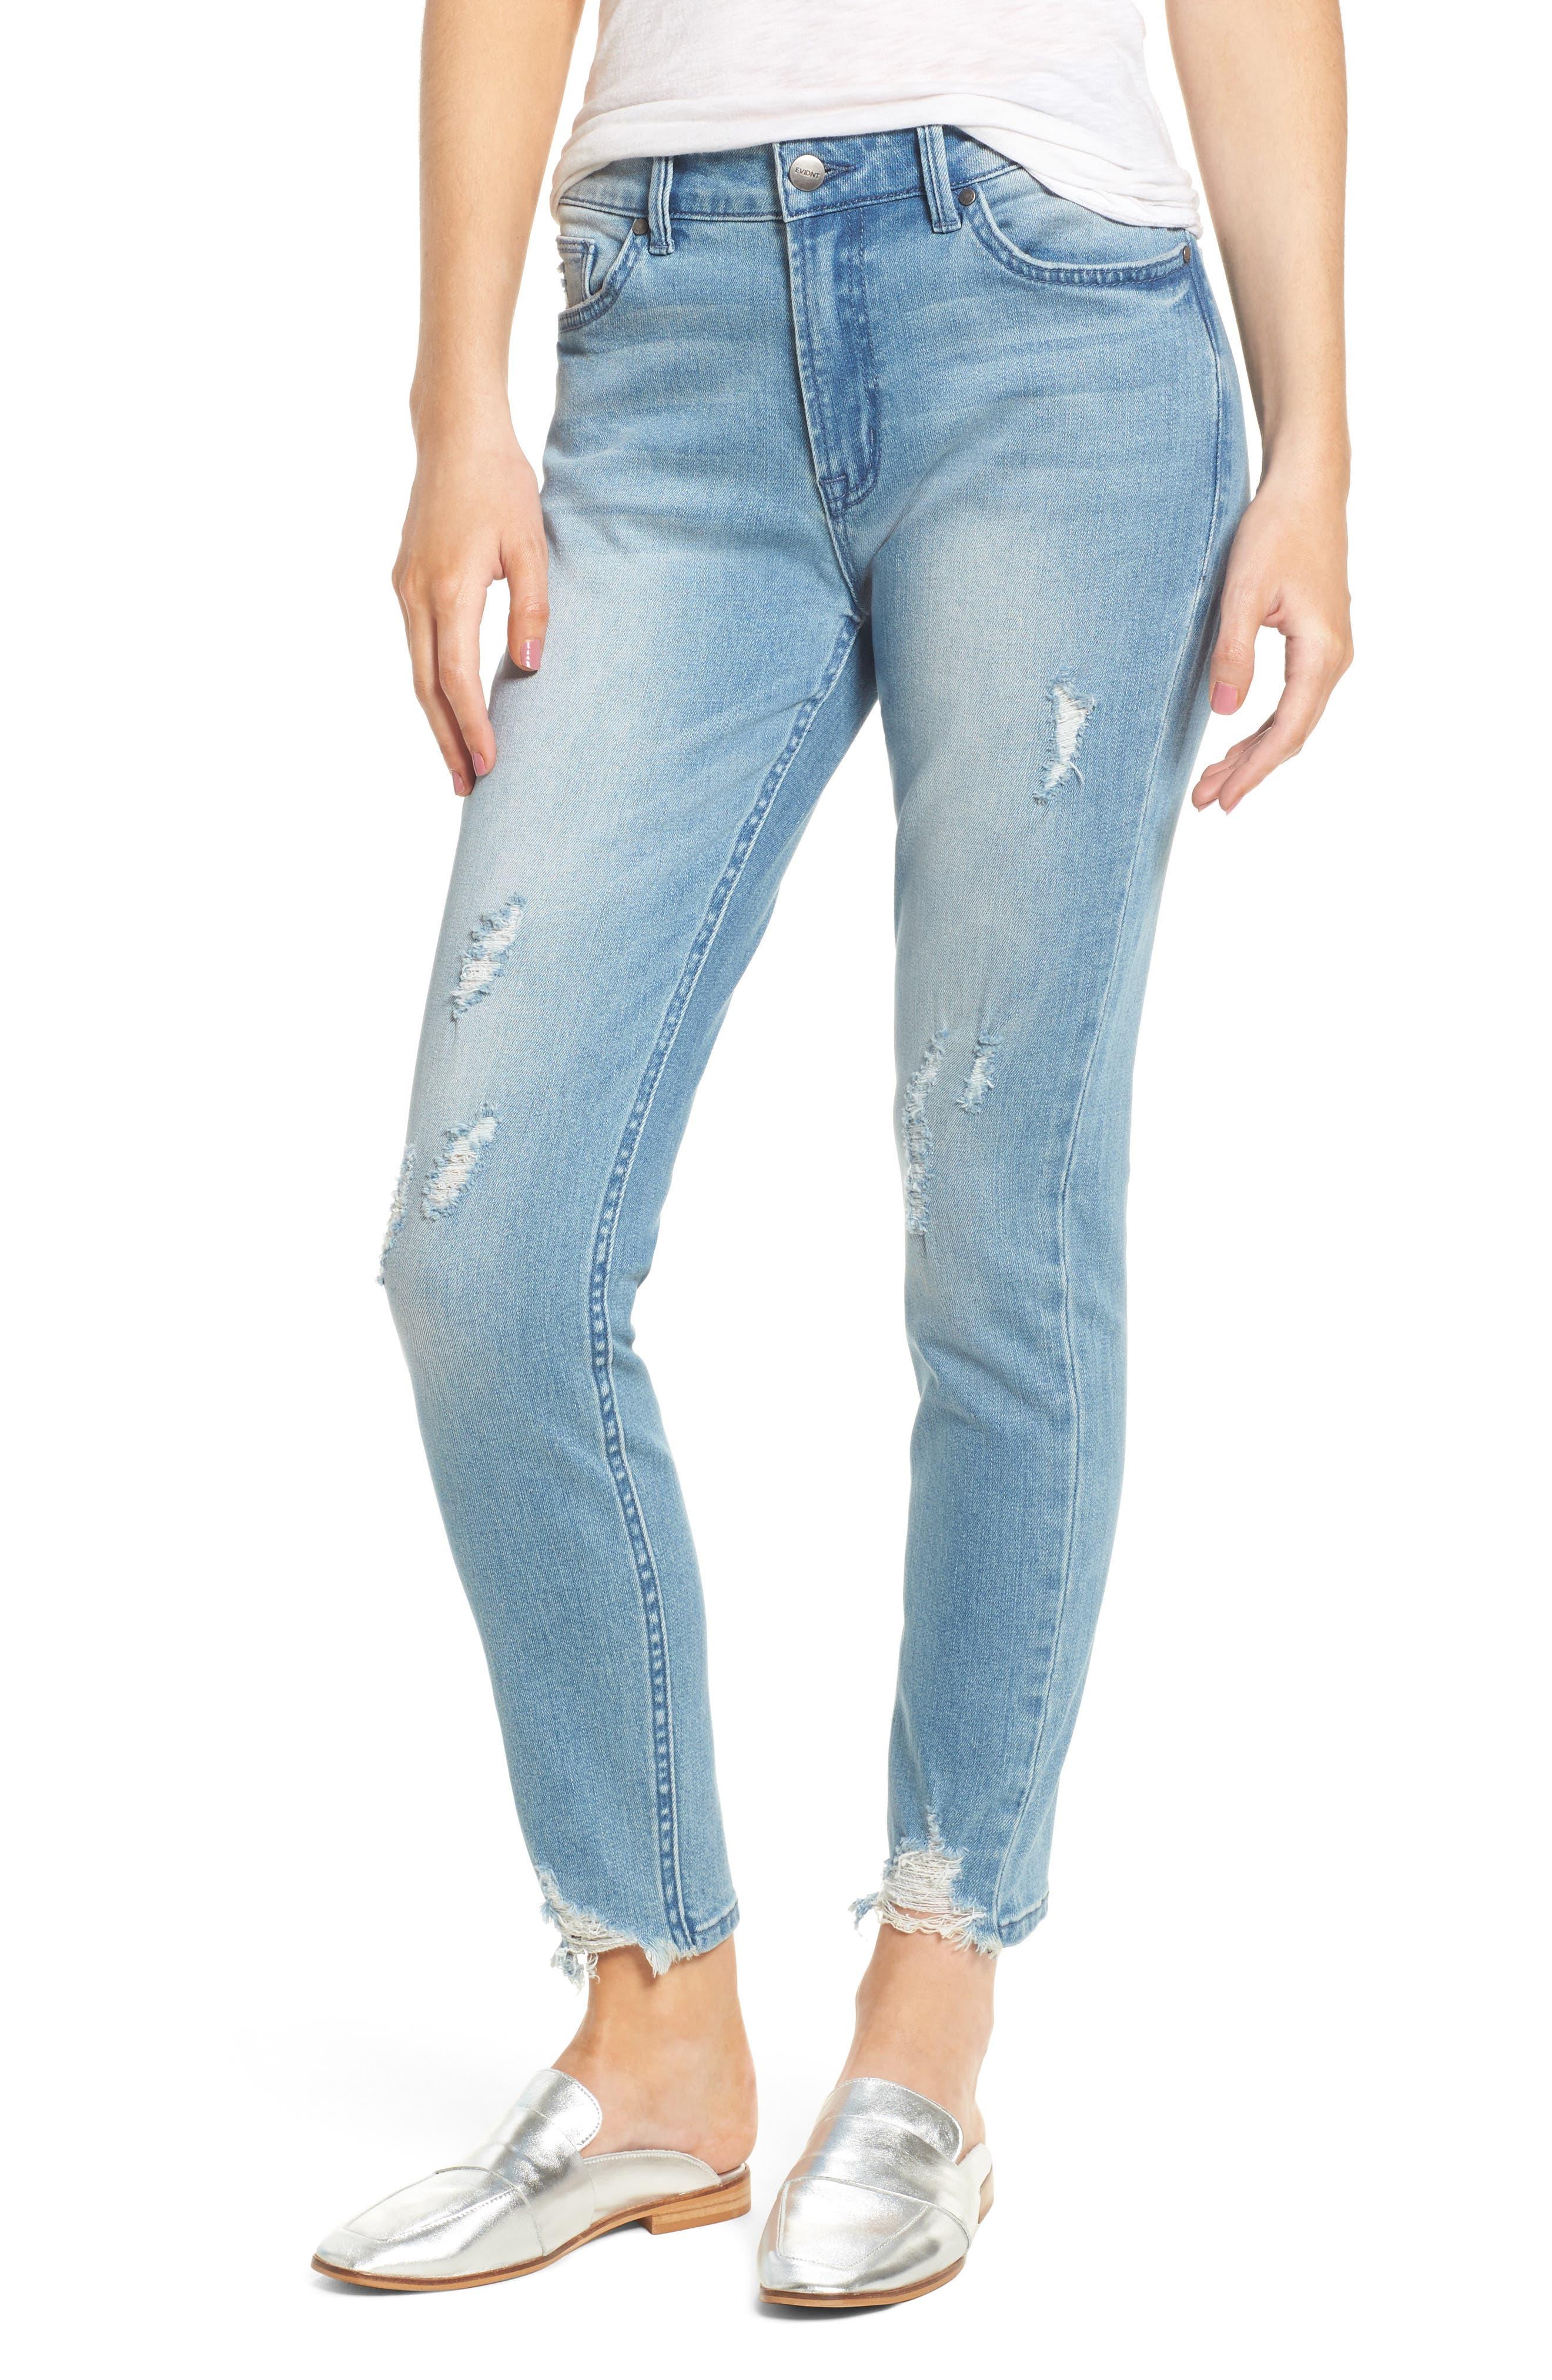 Verona Skinny Jeans,                             Main thumbnail 1, color,                             403